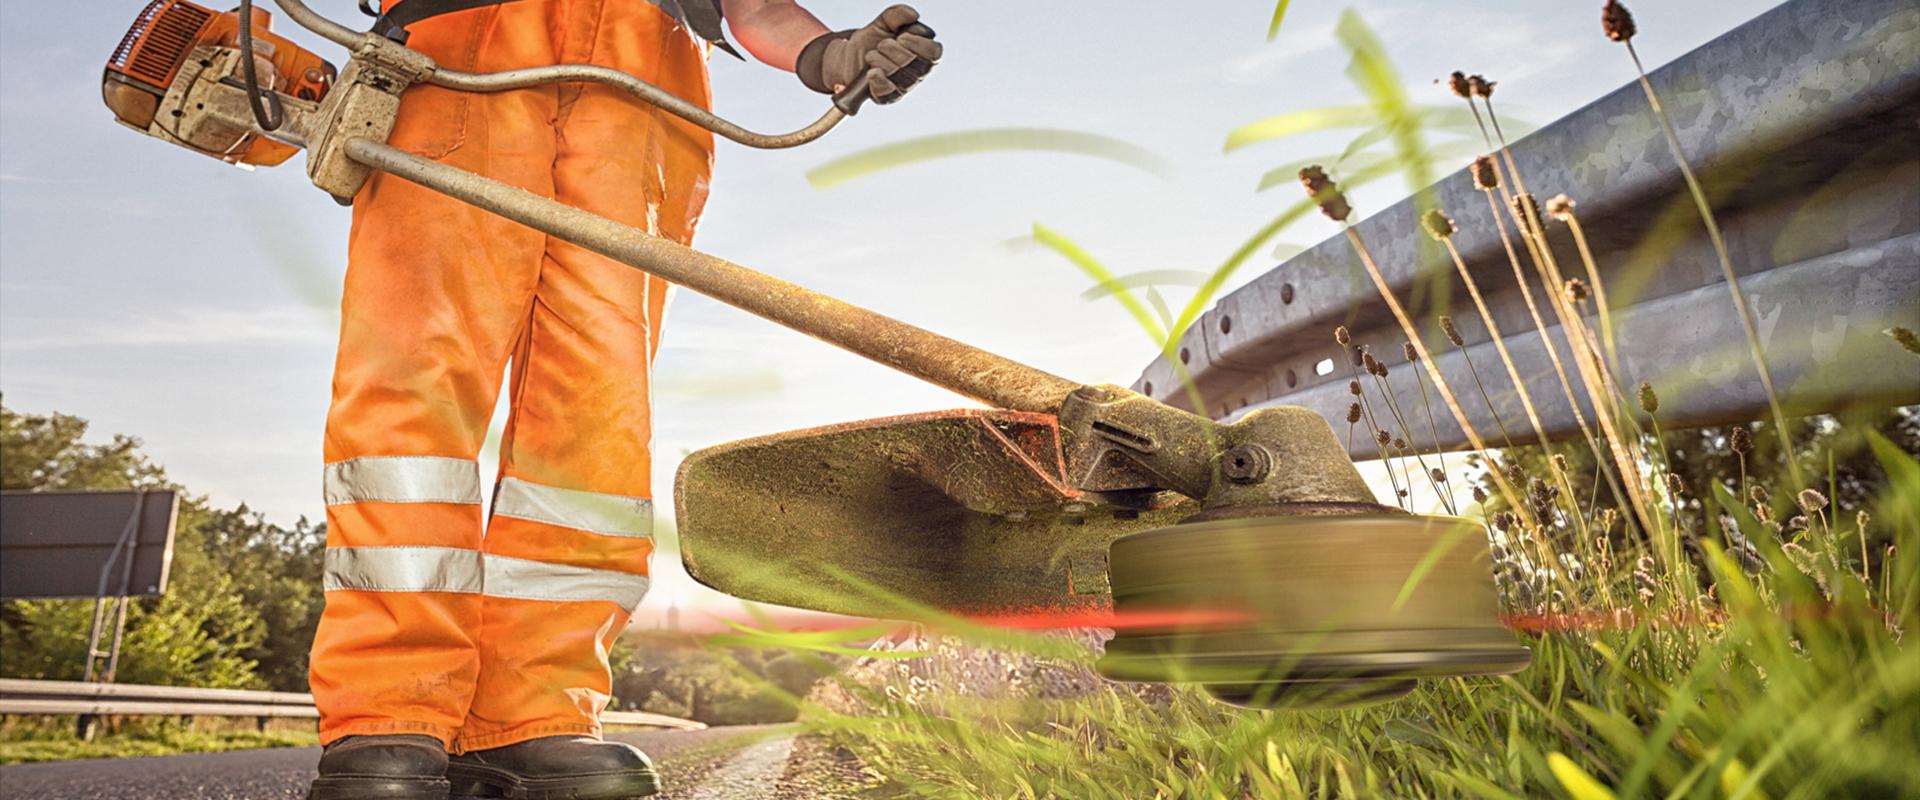 Landschaftspflege: Grünflächenpflege am Straßenrand